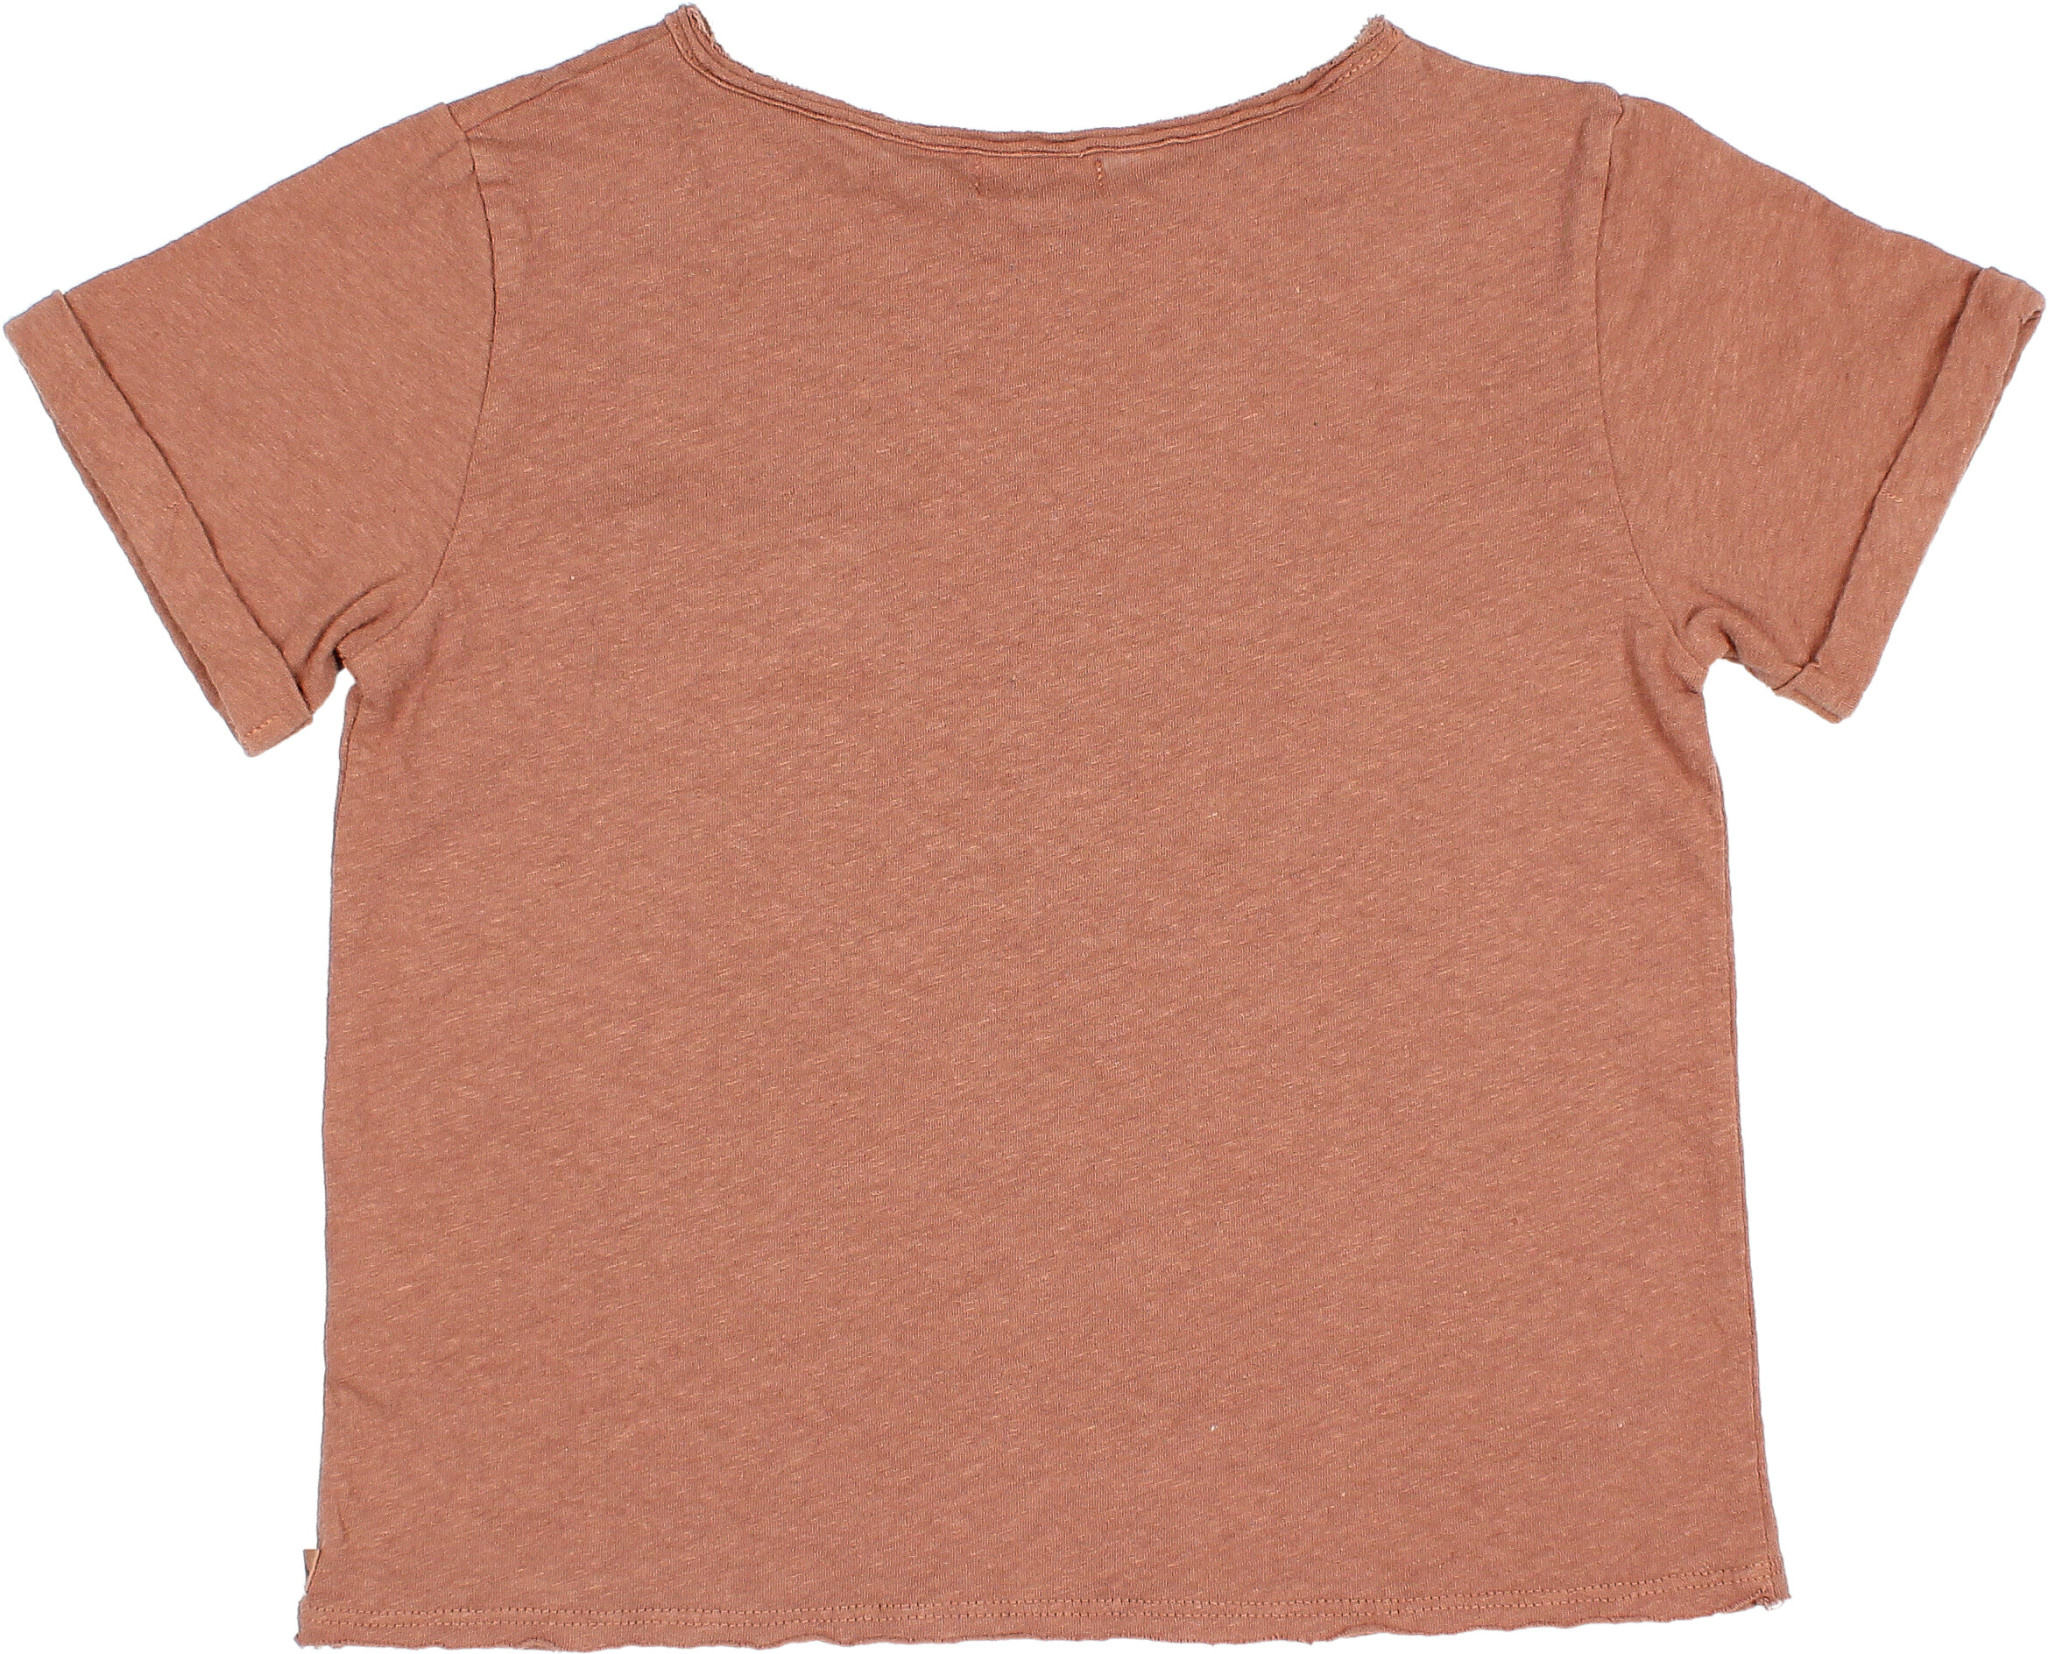 James t-shirt cocoa-2